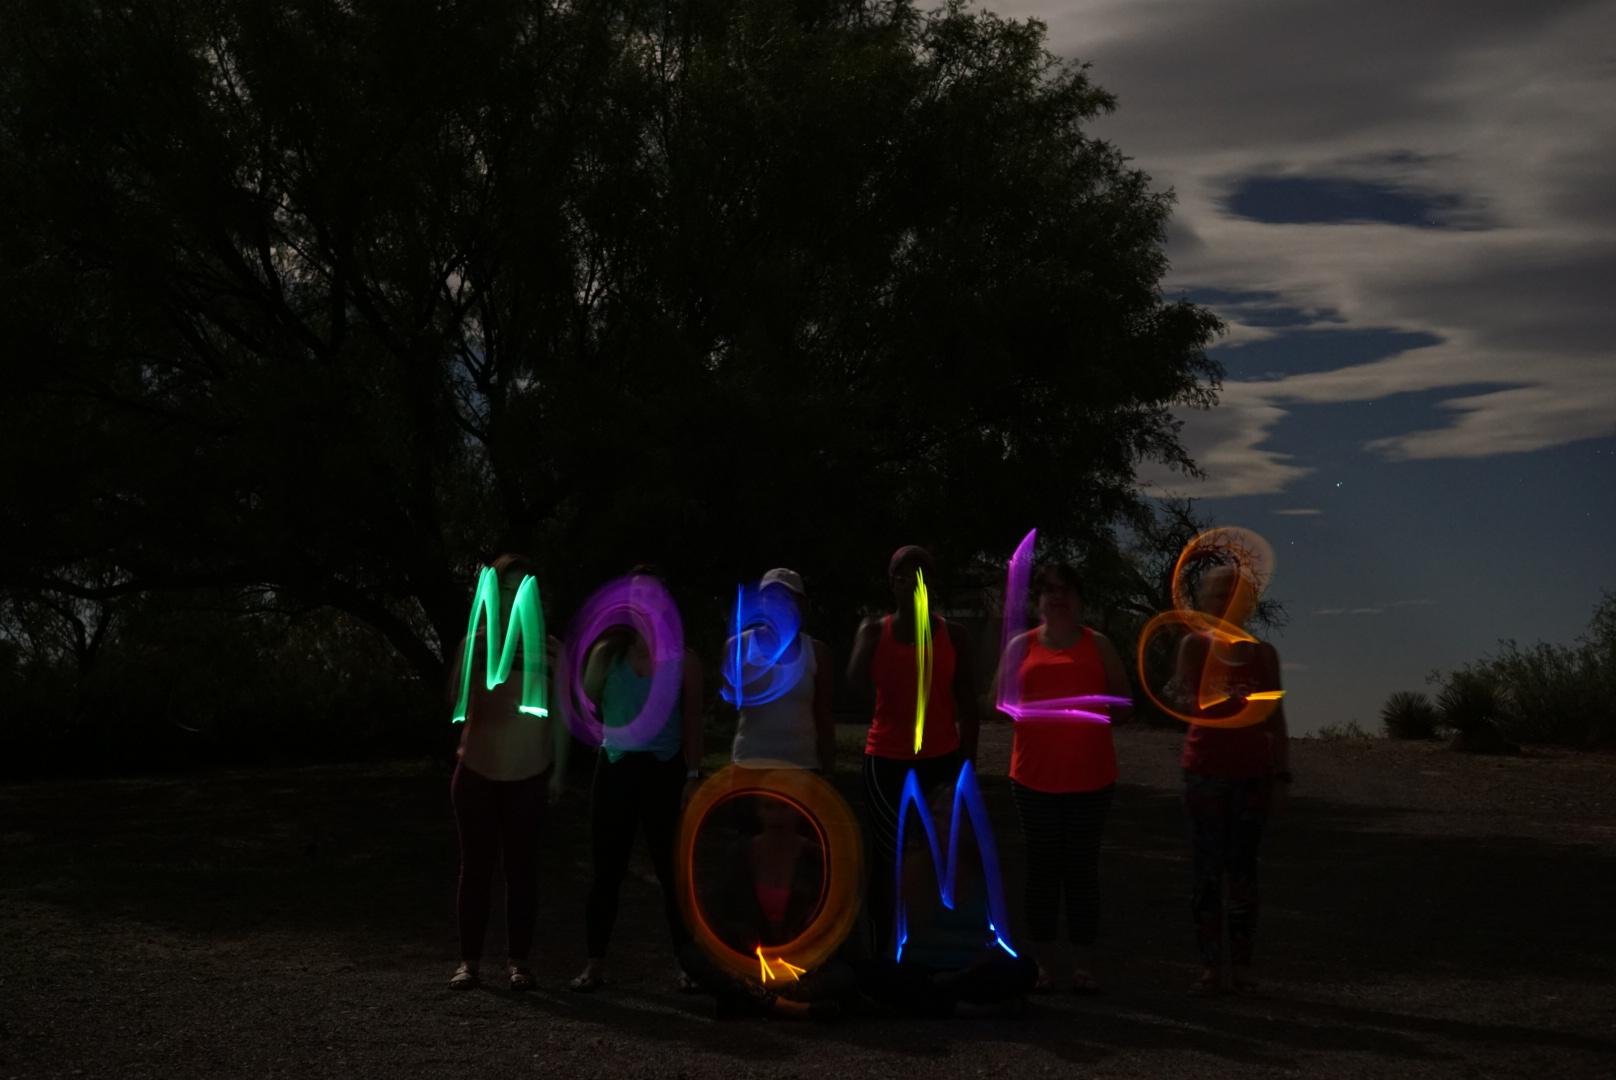 glow-stick-photos-alternative-sparkler-pictures-5